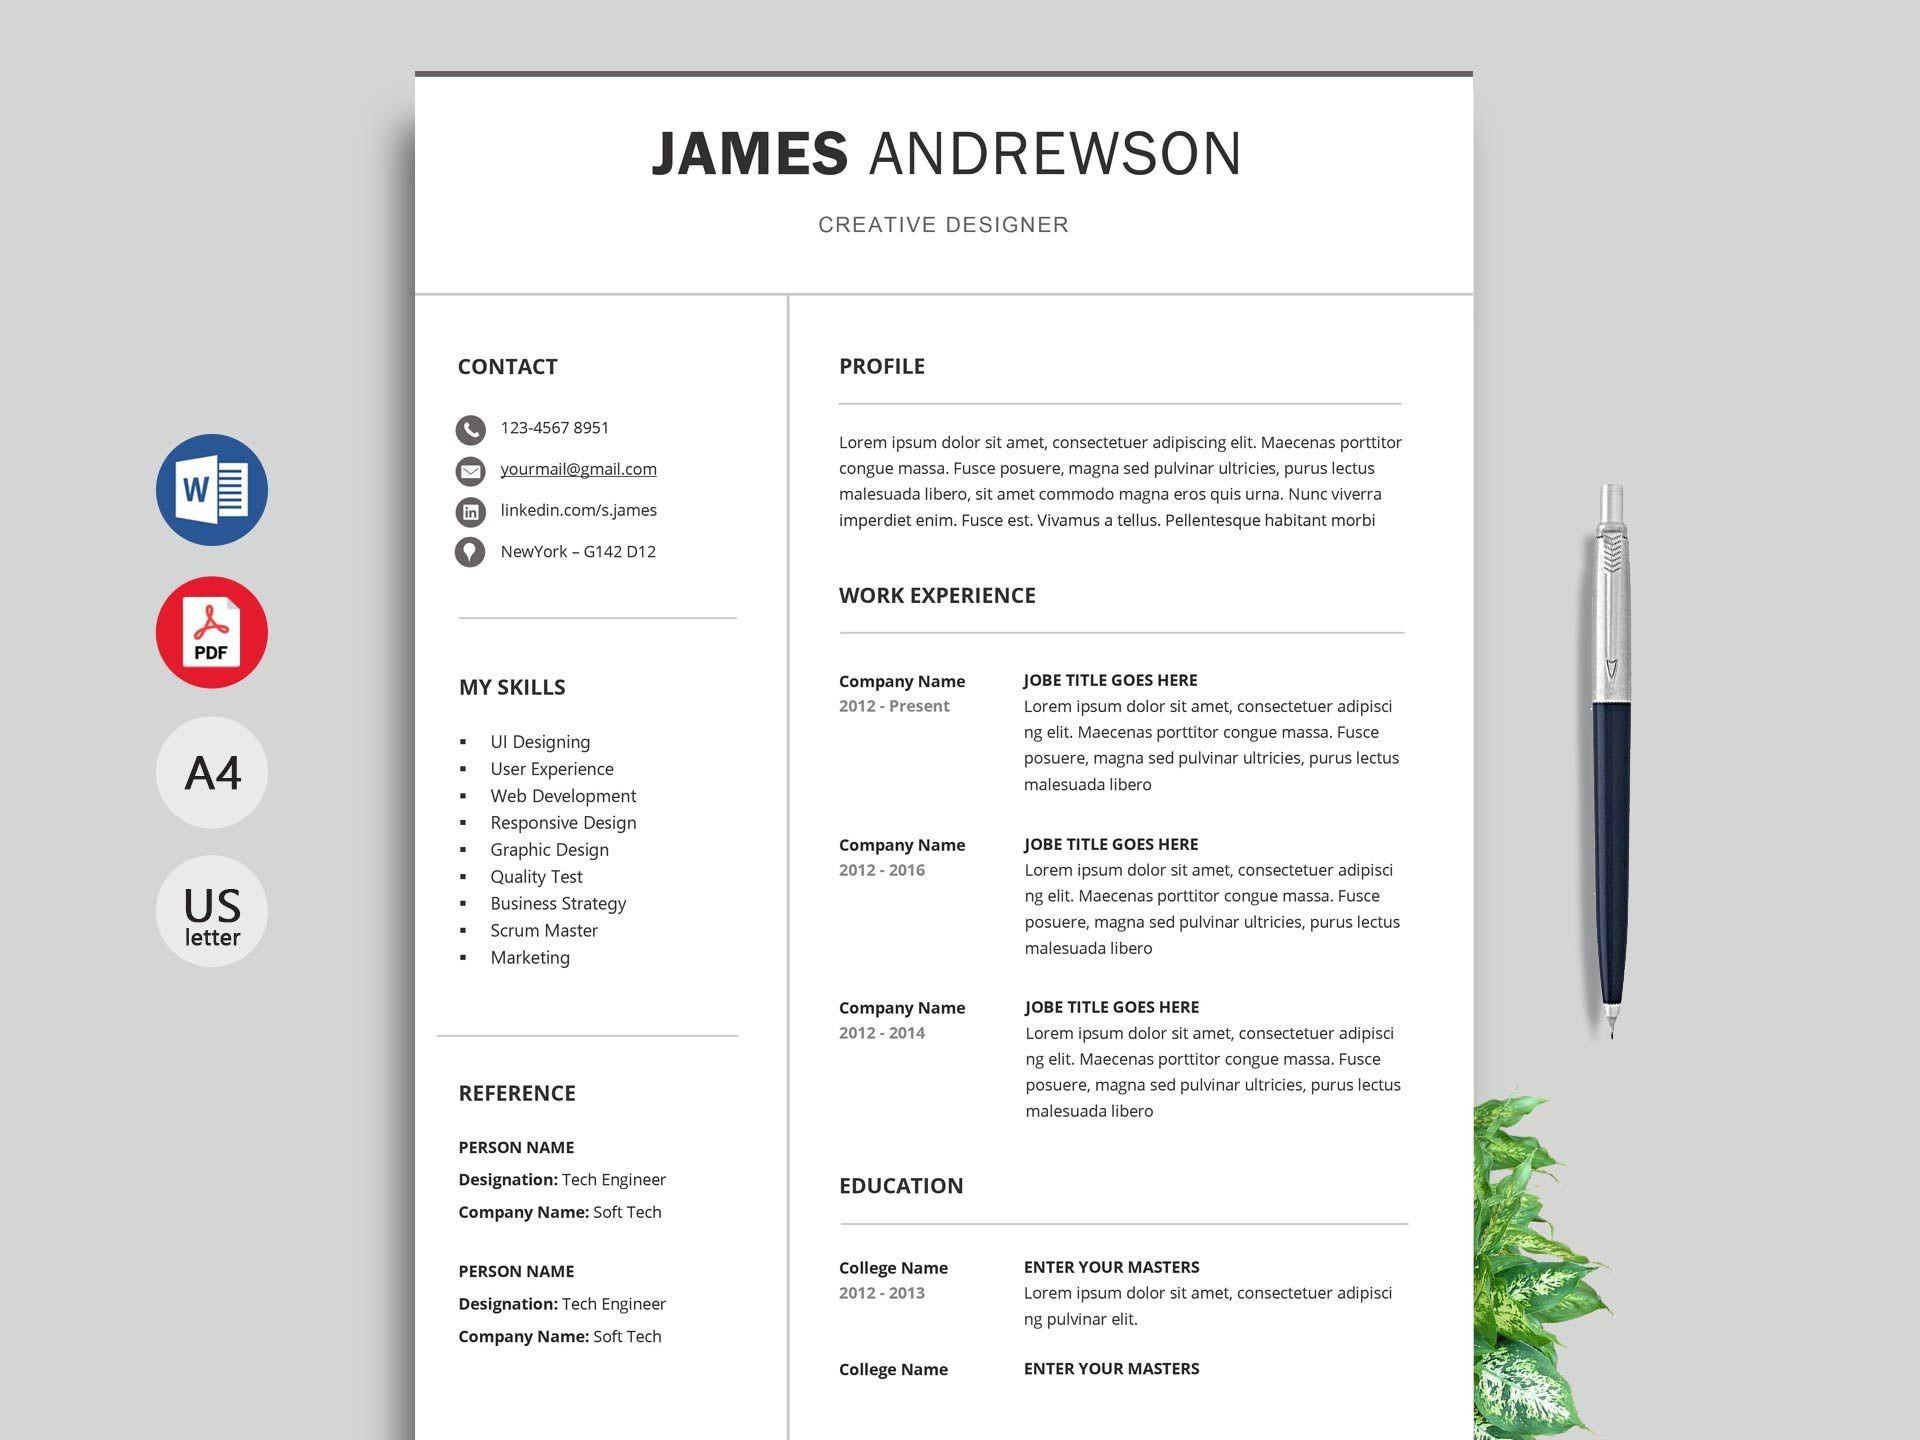 004 Breathtaking Professional Cv Template Free Word Image  Uk Best Resume Download1920